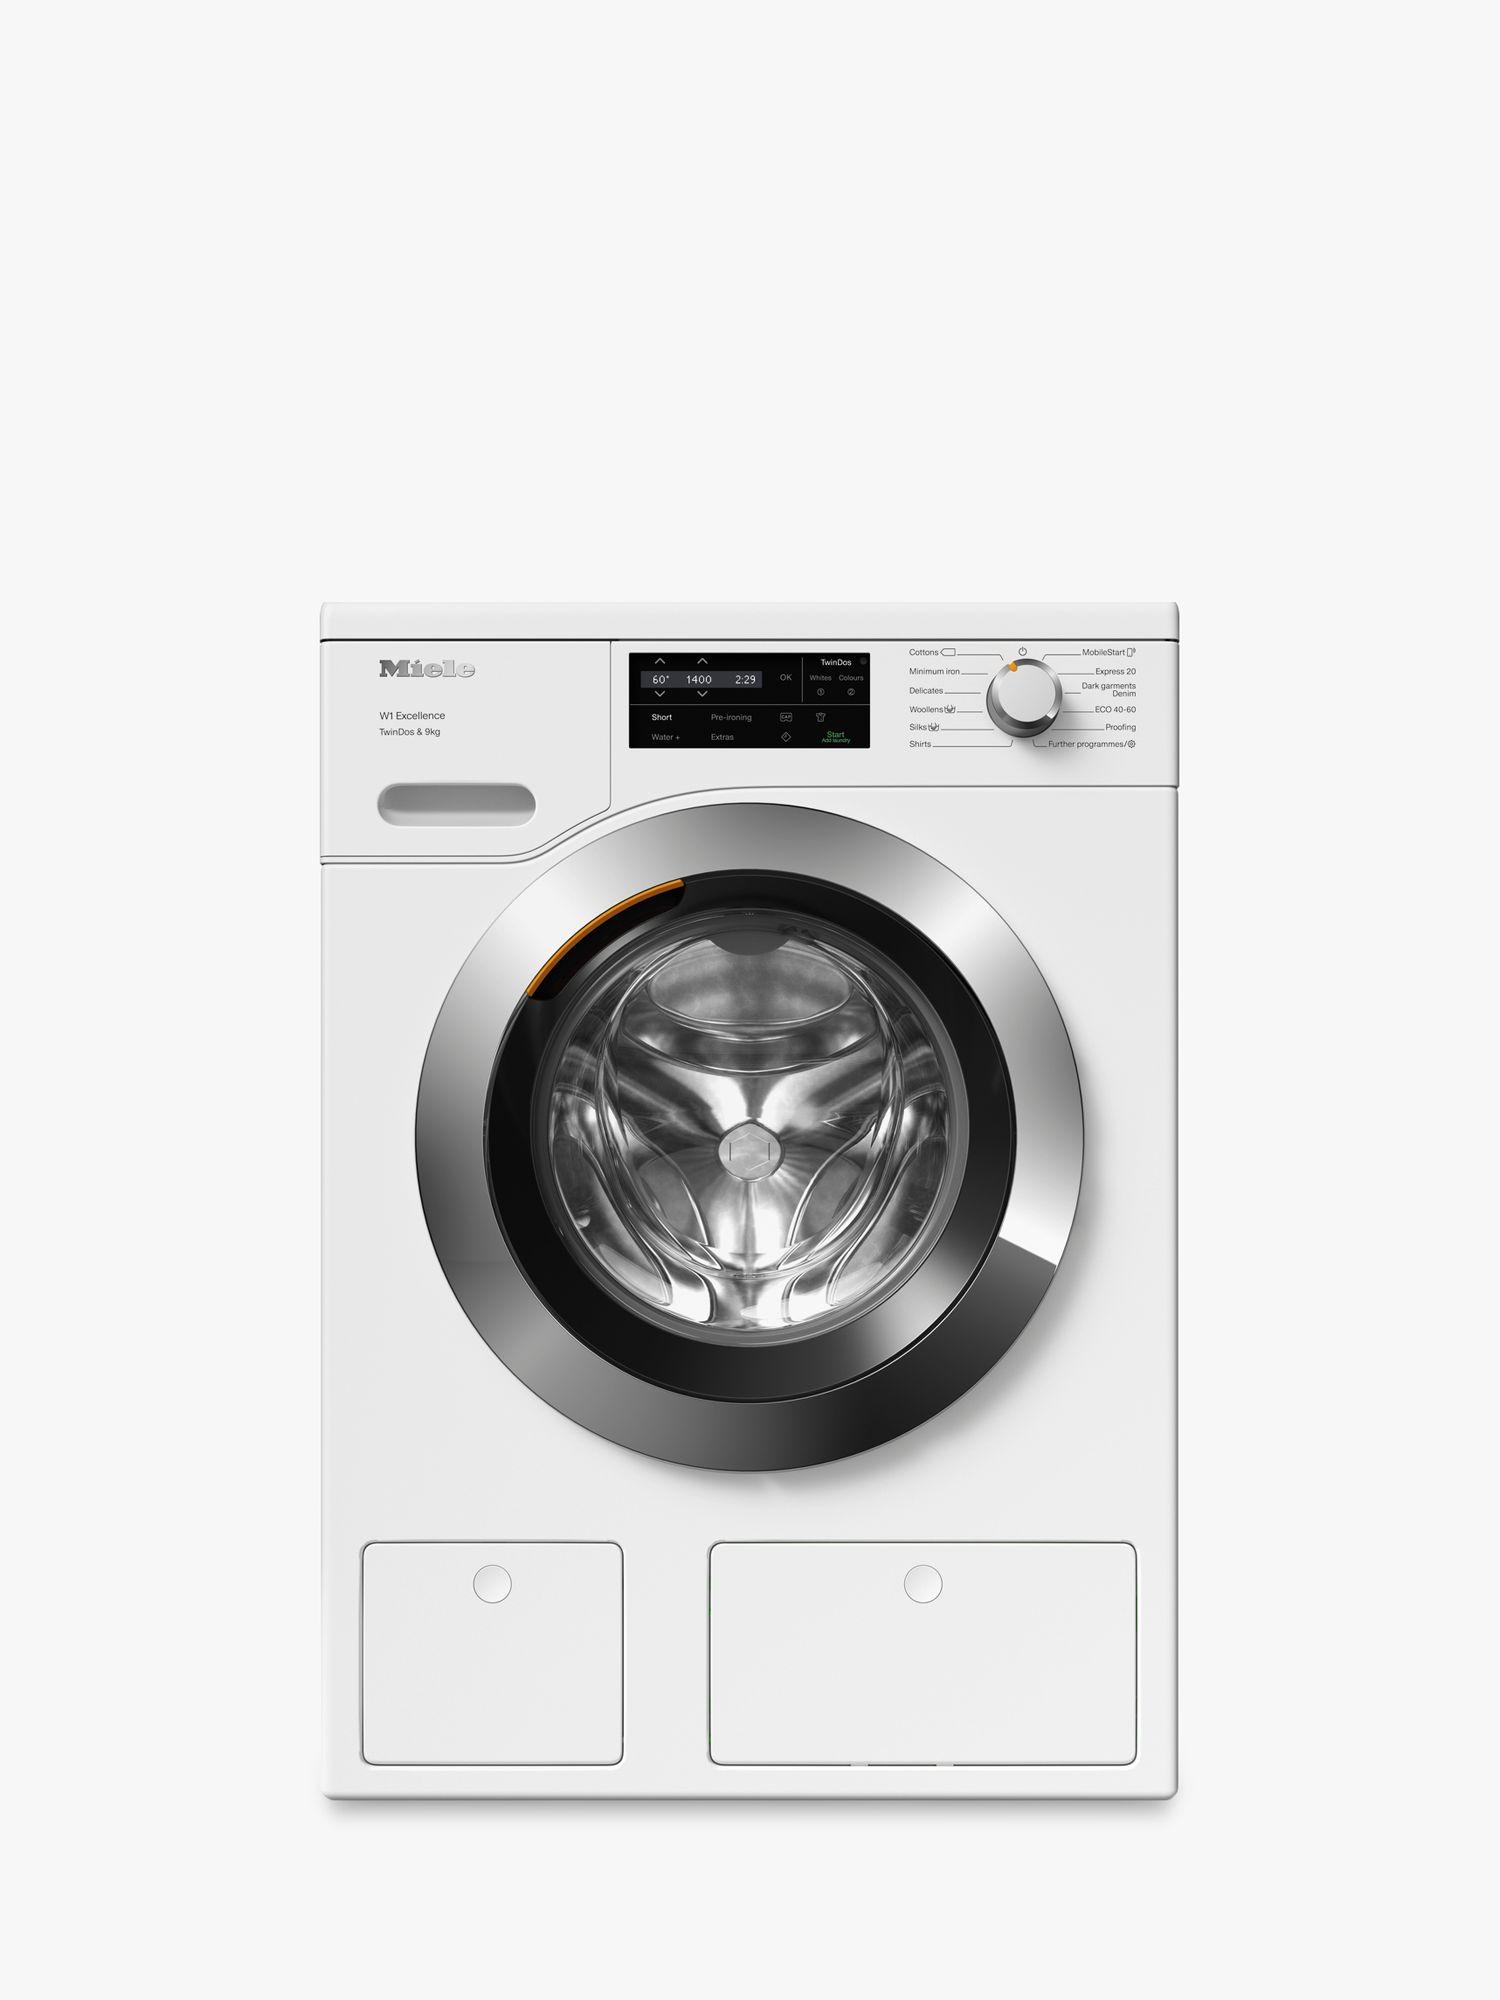 Miele Miele WEG665 Freestanding Washing Machine, 9kg, 1400rpm, A+++ Energy Rating, White